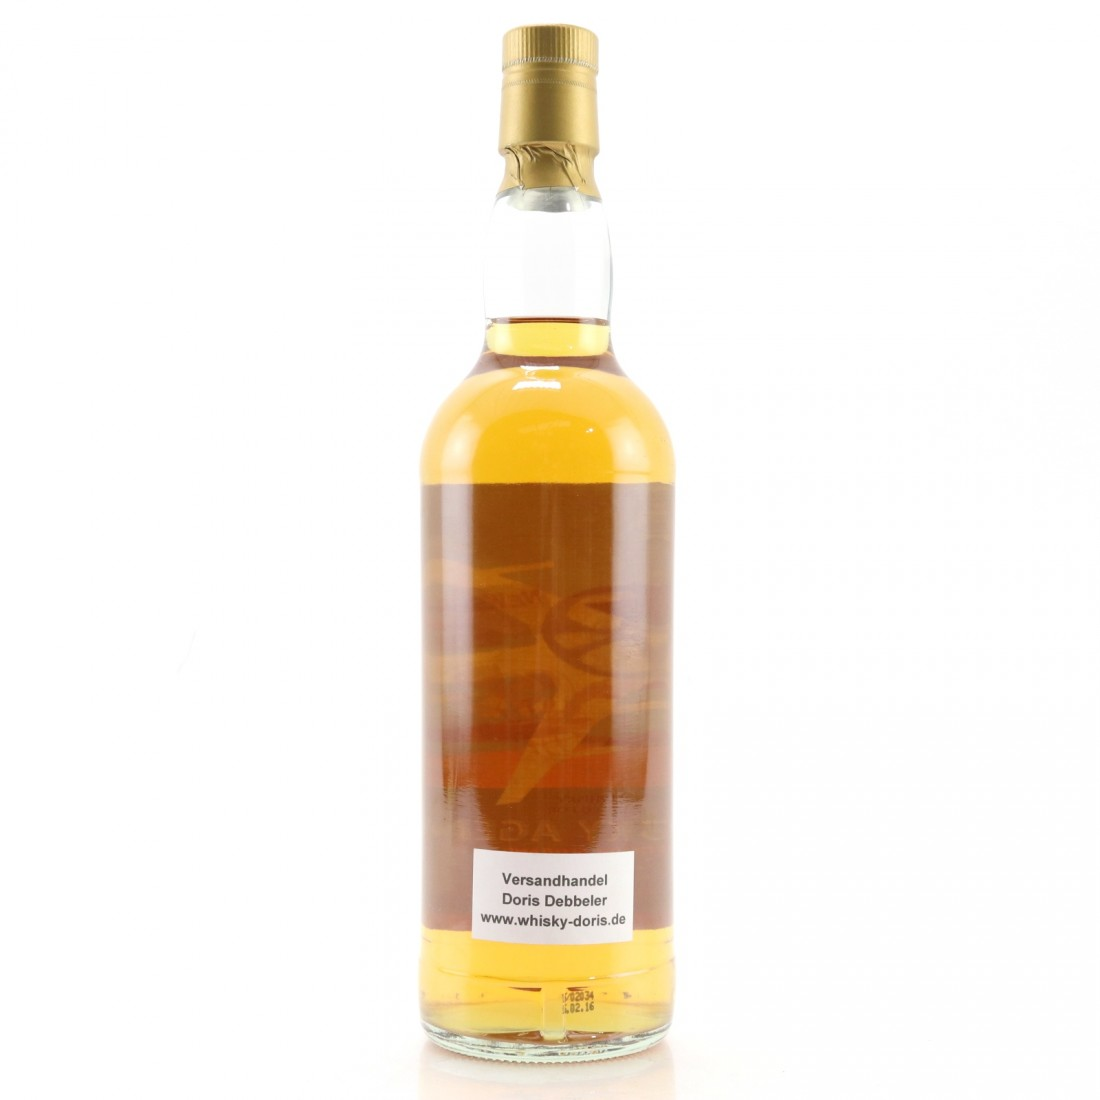 Speyside Single Malt 1975 Whisky Agency 40 Year Old